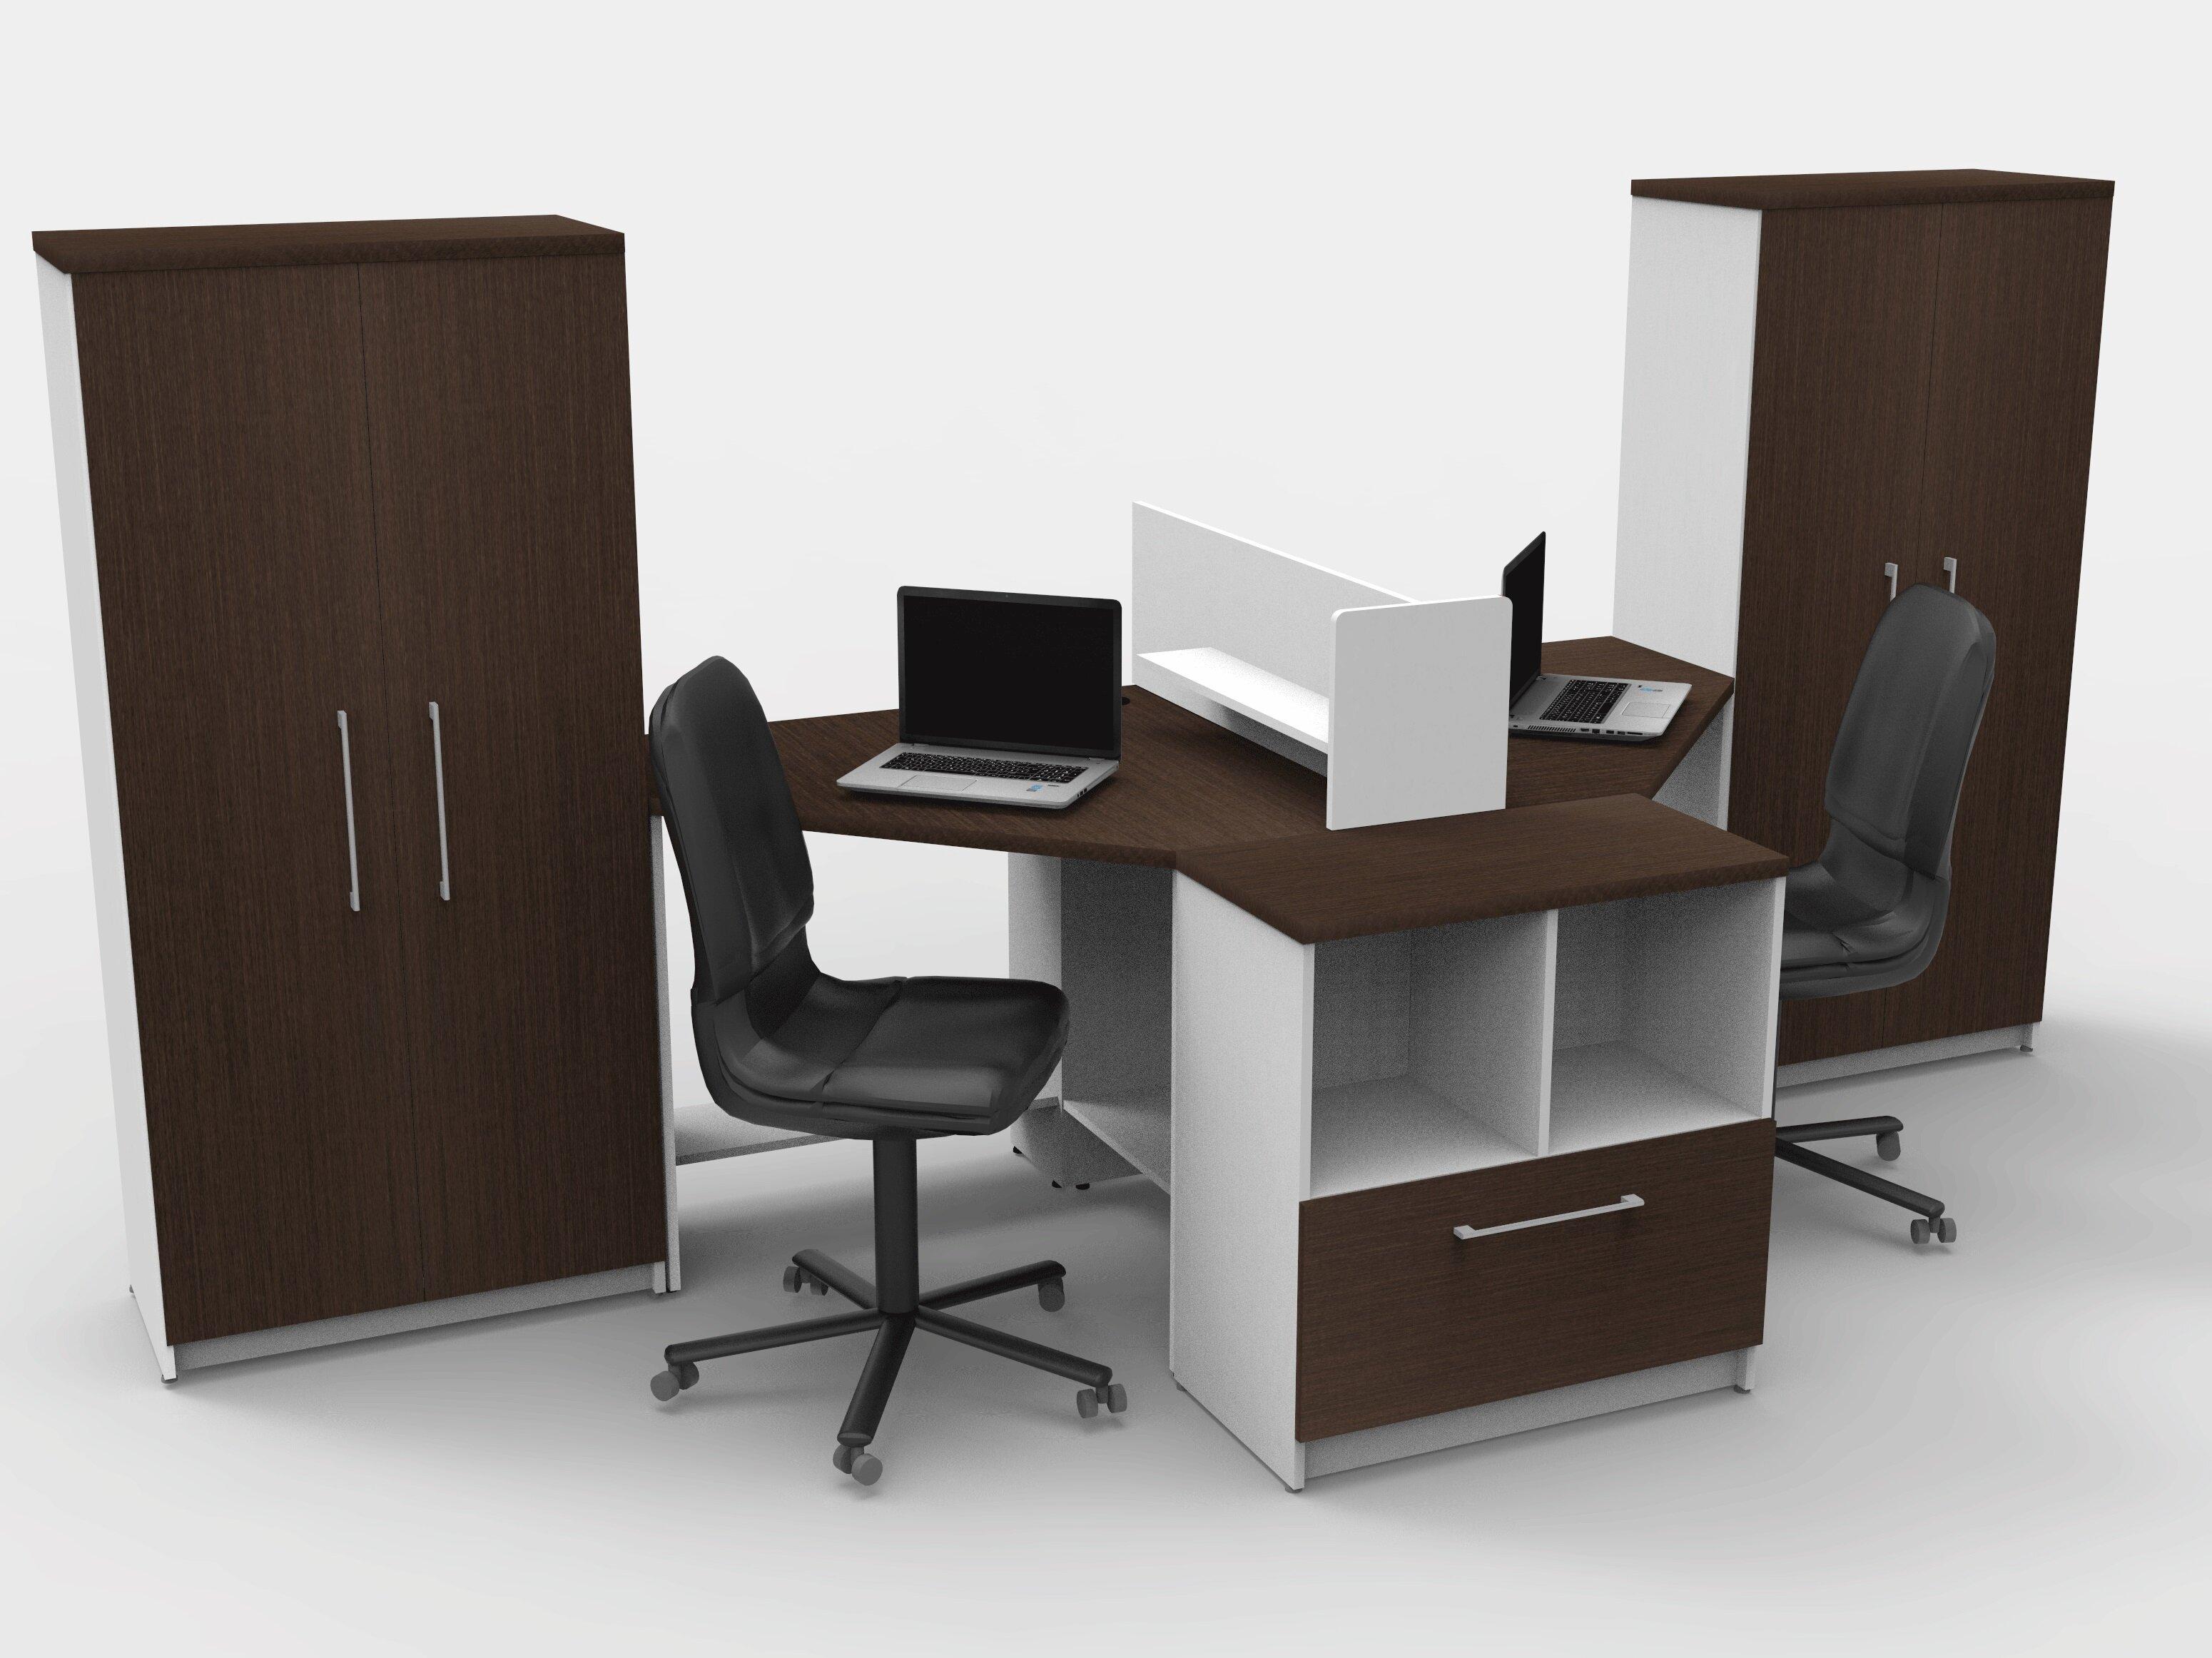 Beau TeamCENTERoffice Triangular Corner 6 Piece L Shaped Desk Office Suite |  Wayfair